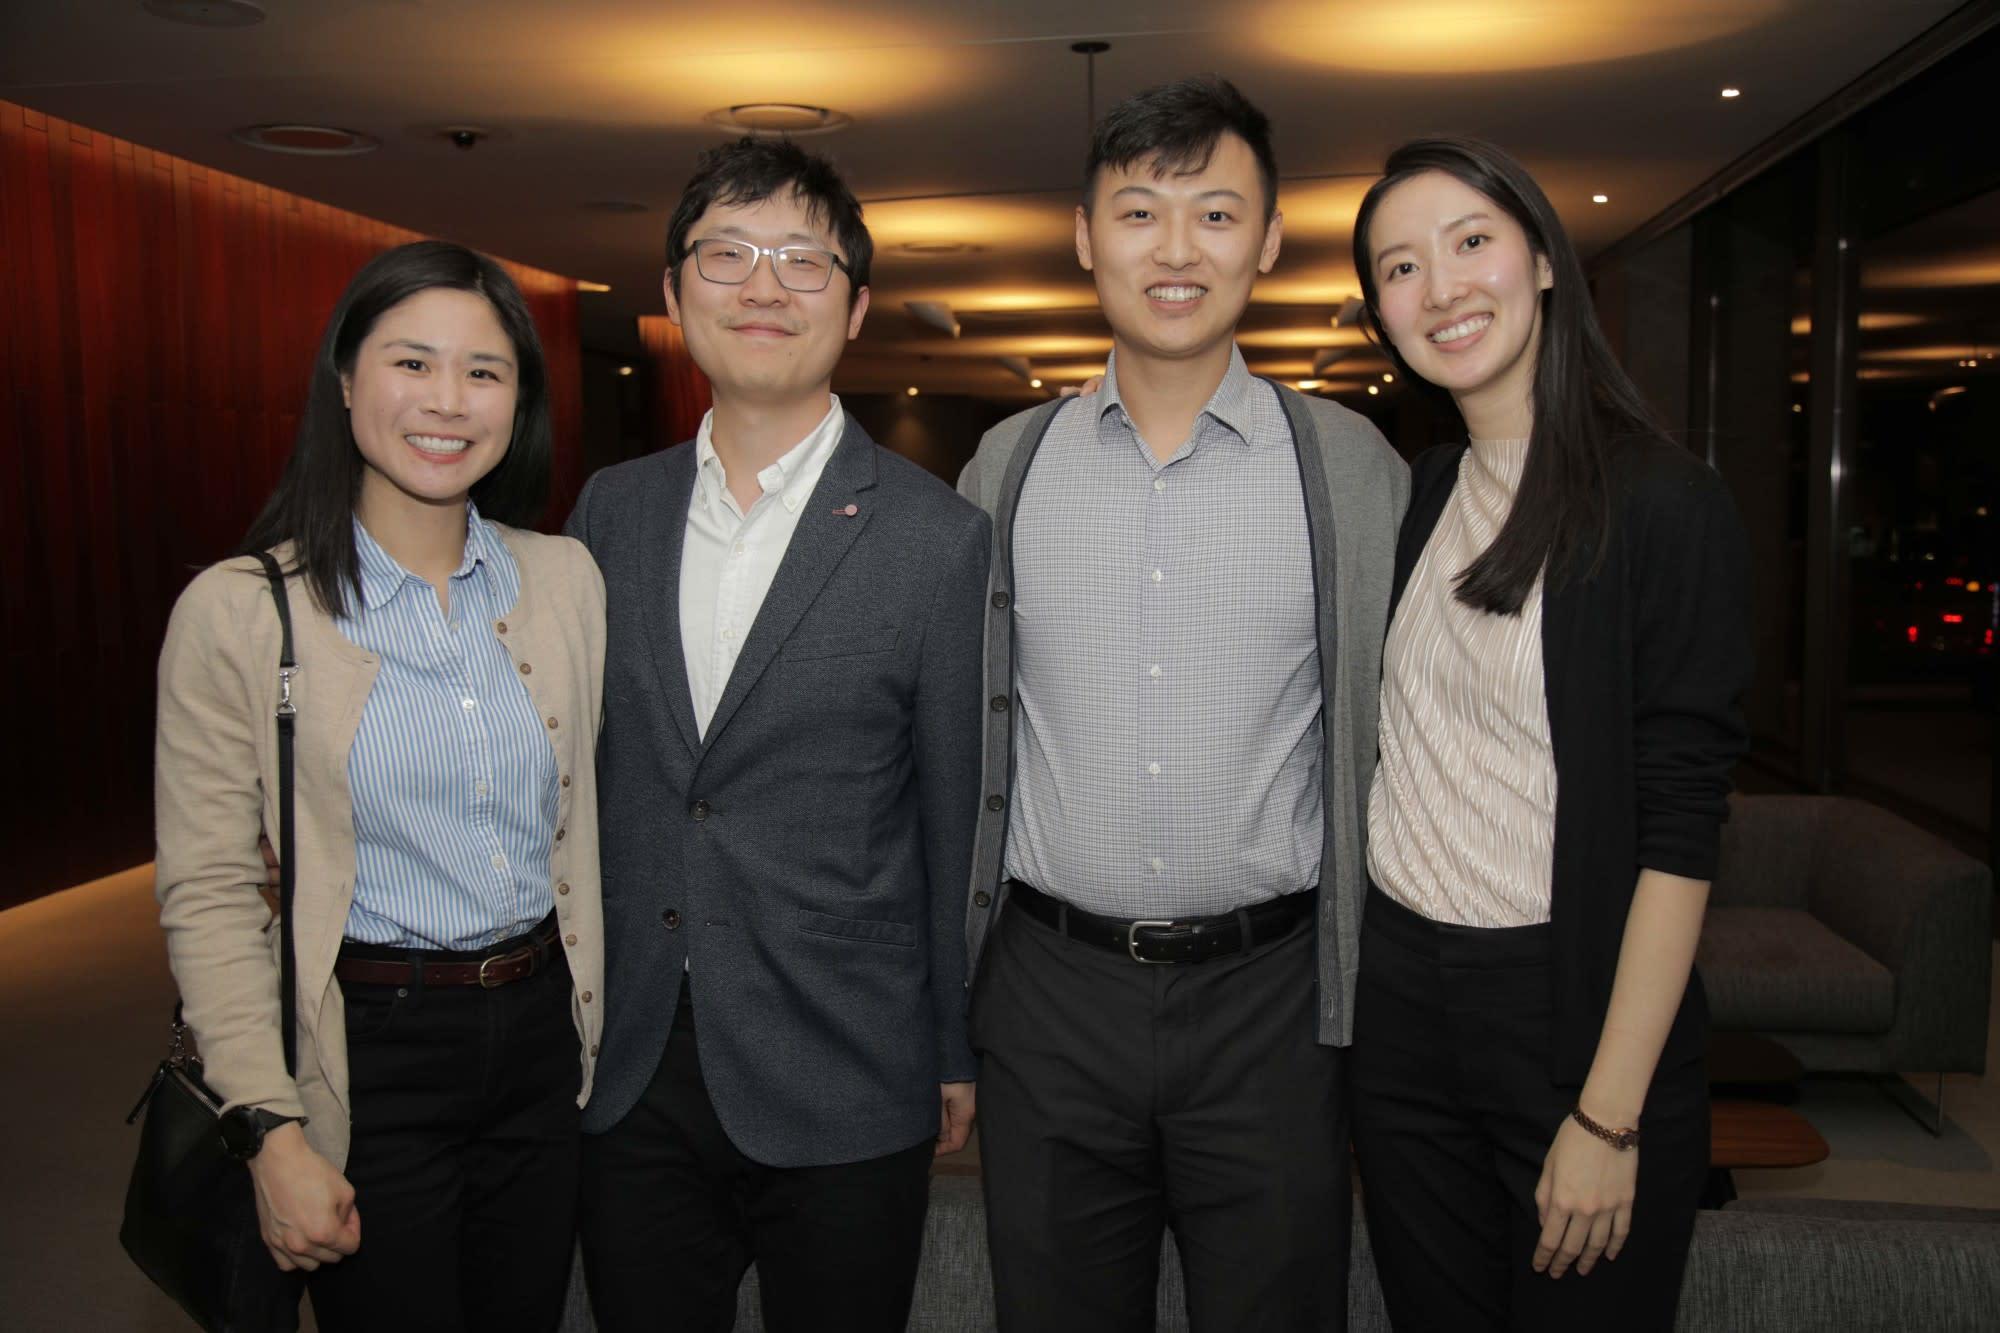 Liana and Joseph Lim, Zeheng Wang and Catherine He